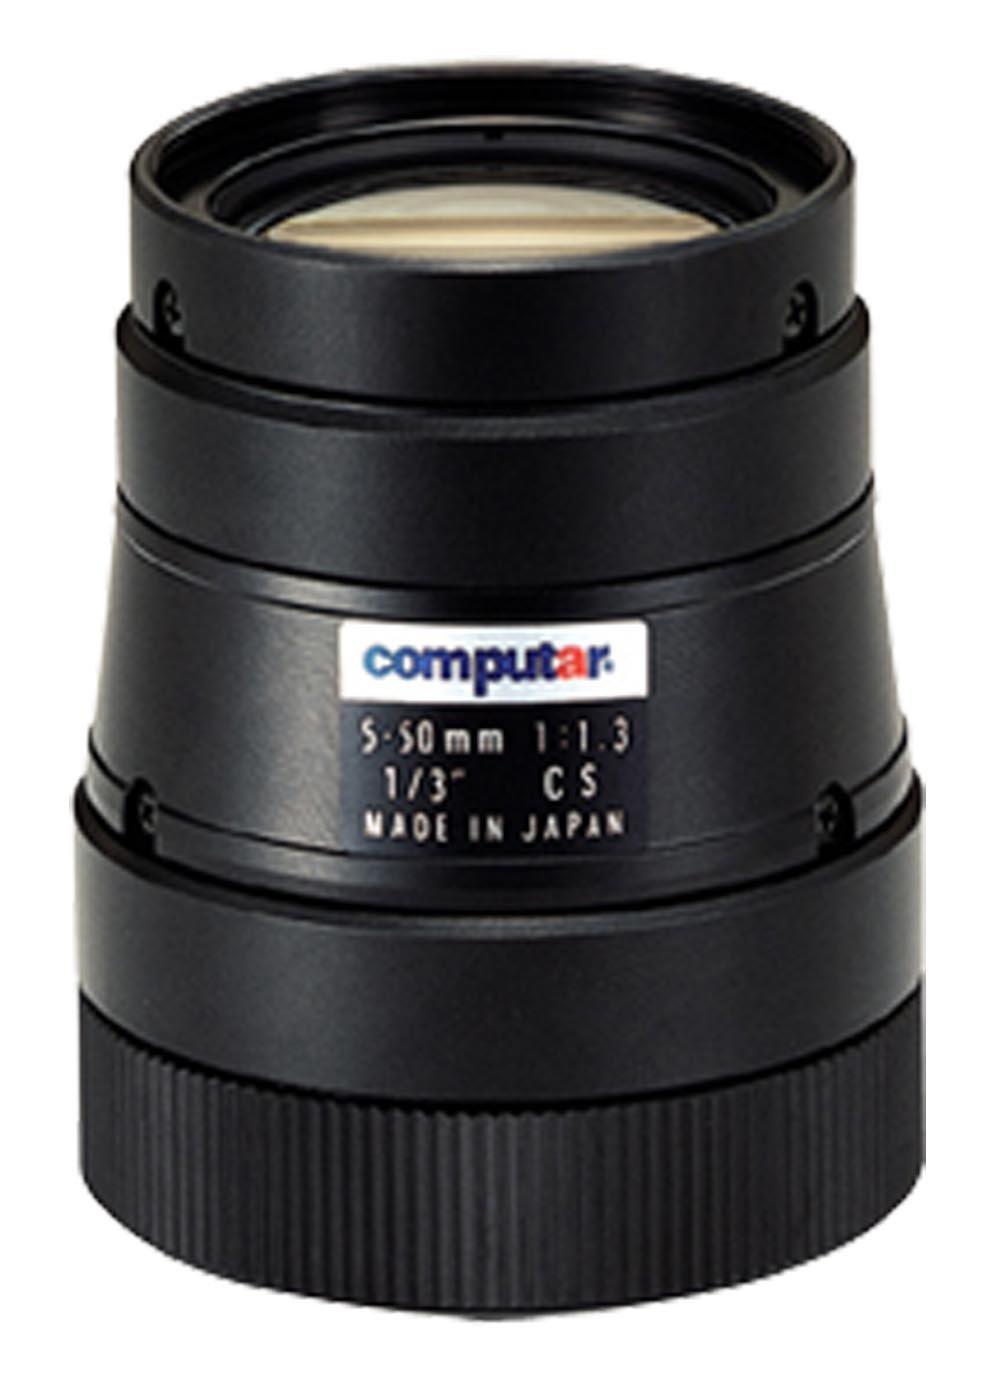 Computar T10Z0513CS 0.33-Inch Varifocal lens 5-50mm F1.3 Manual Iris by Computar